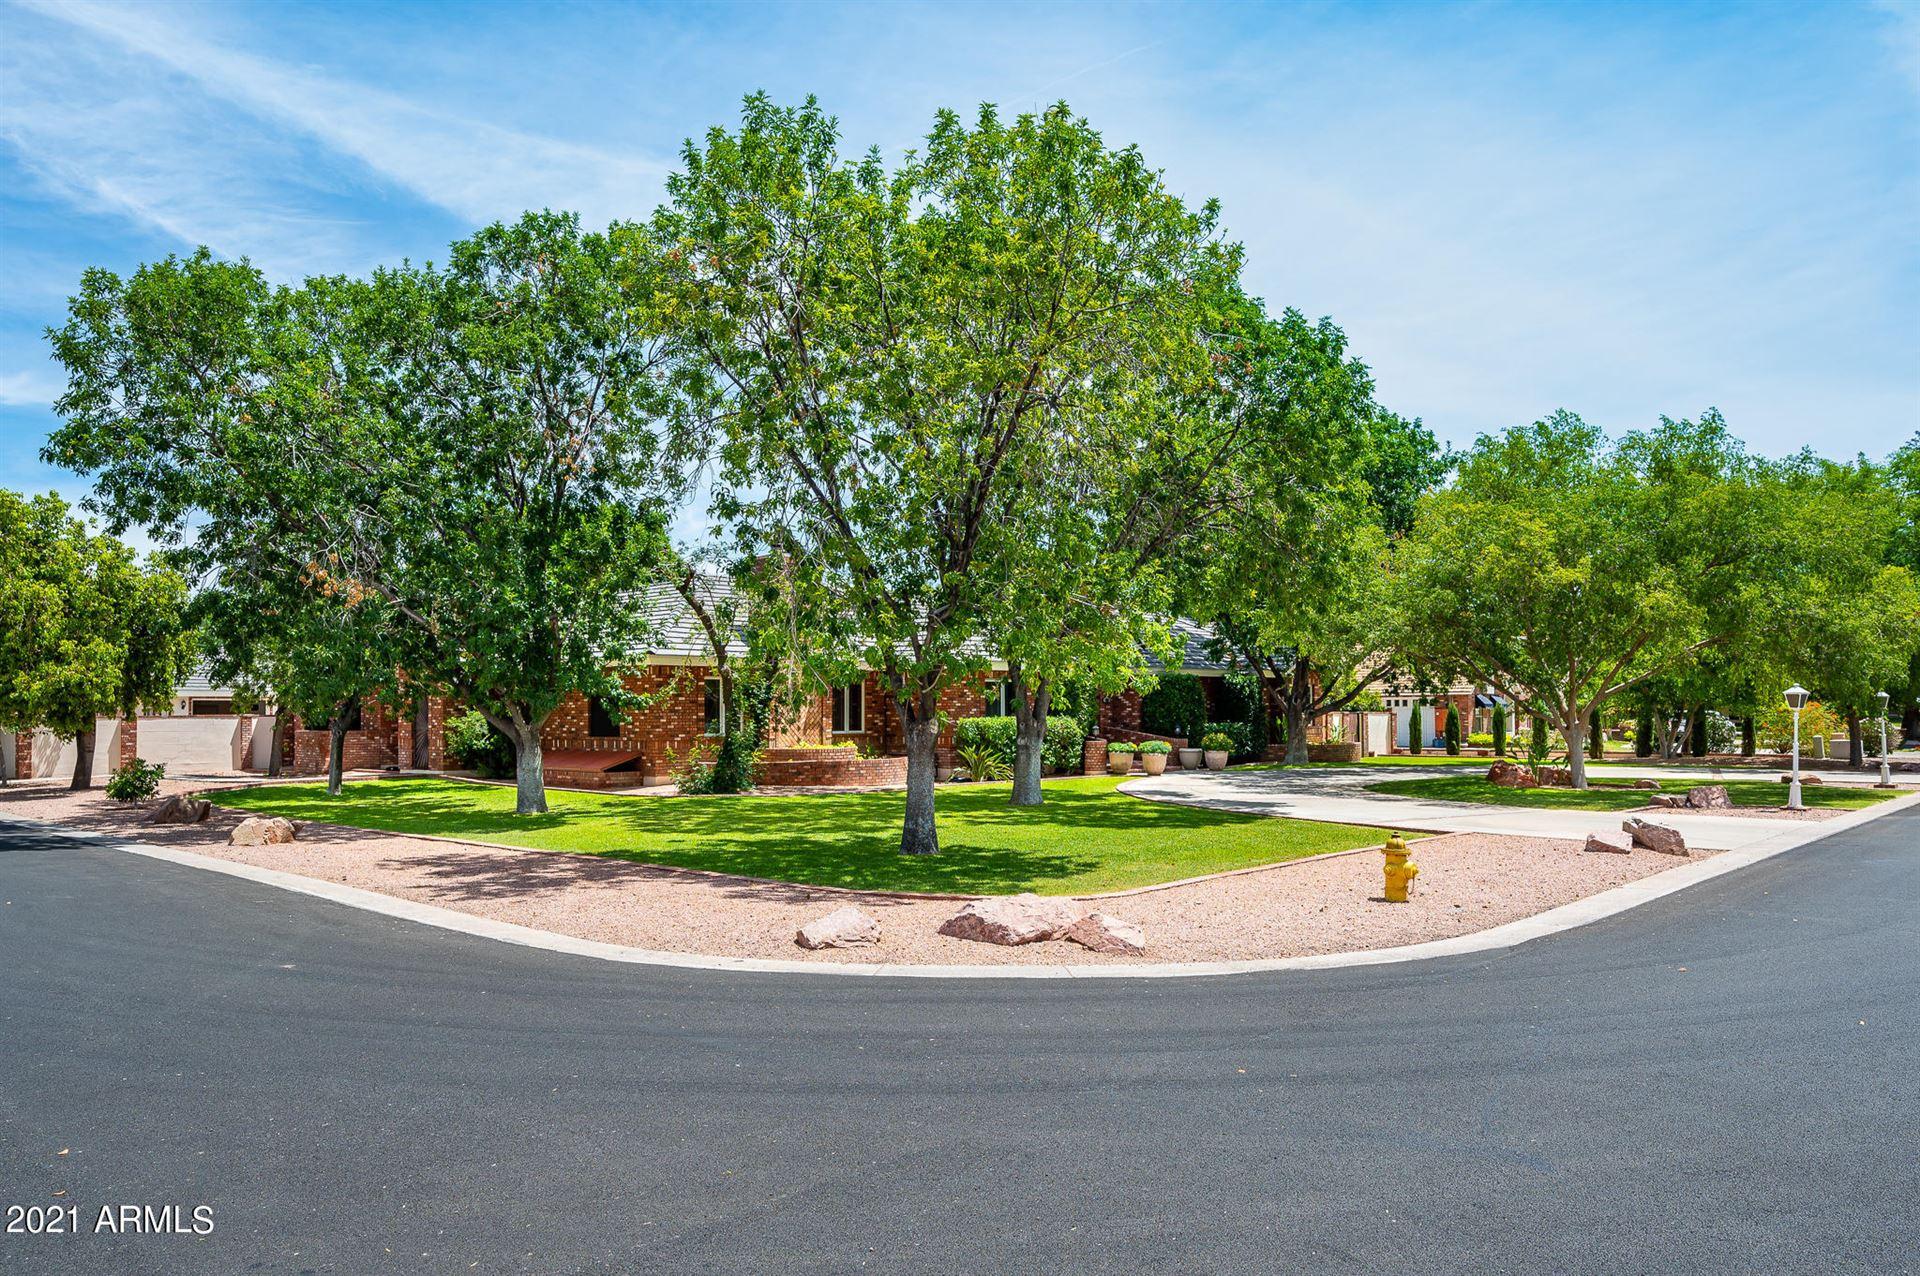 Photo of 902 E JUANITA Avenue, Gilbert, AZ 85234 (MLS # 6249213)